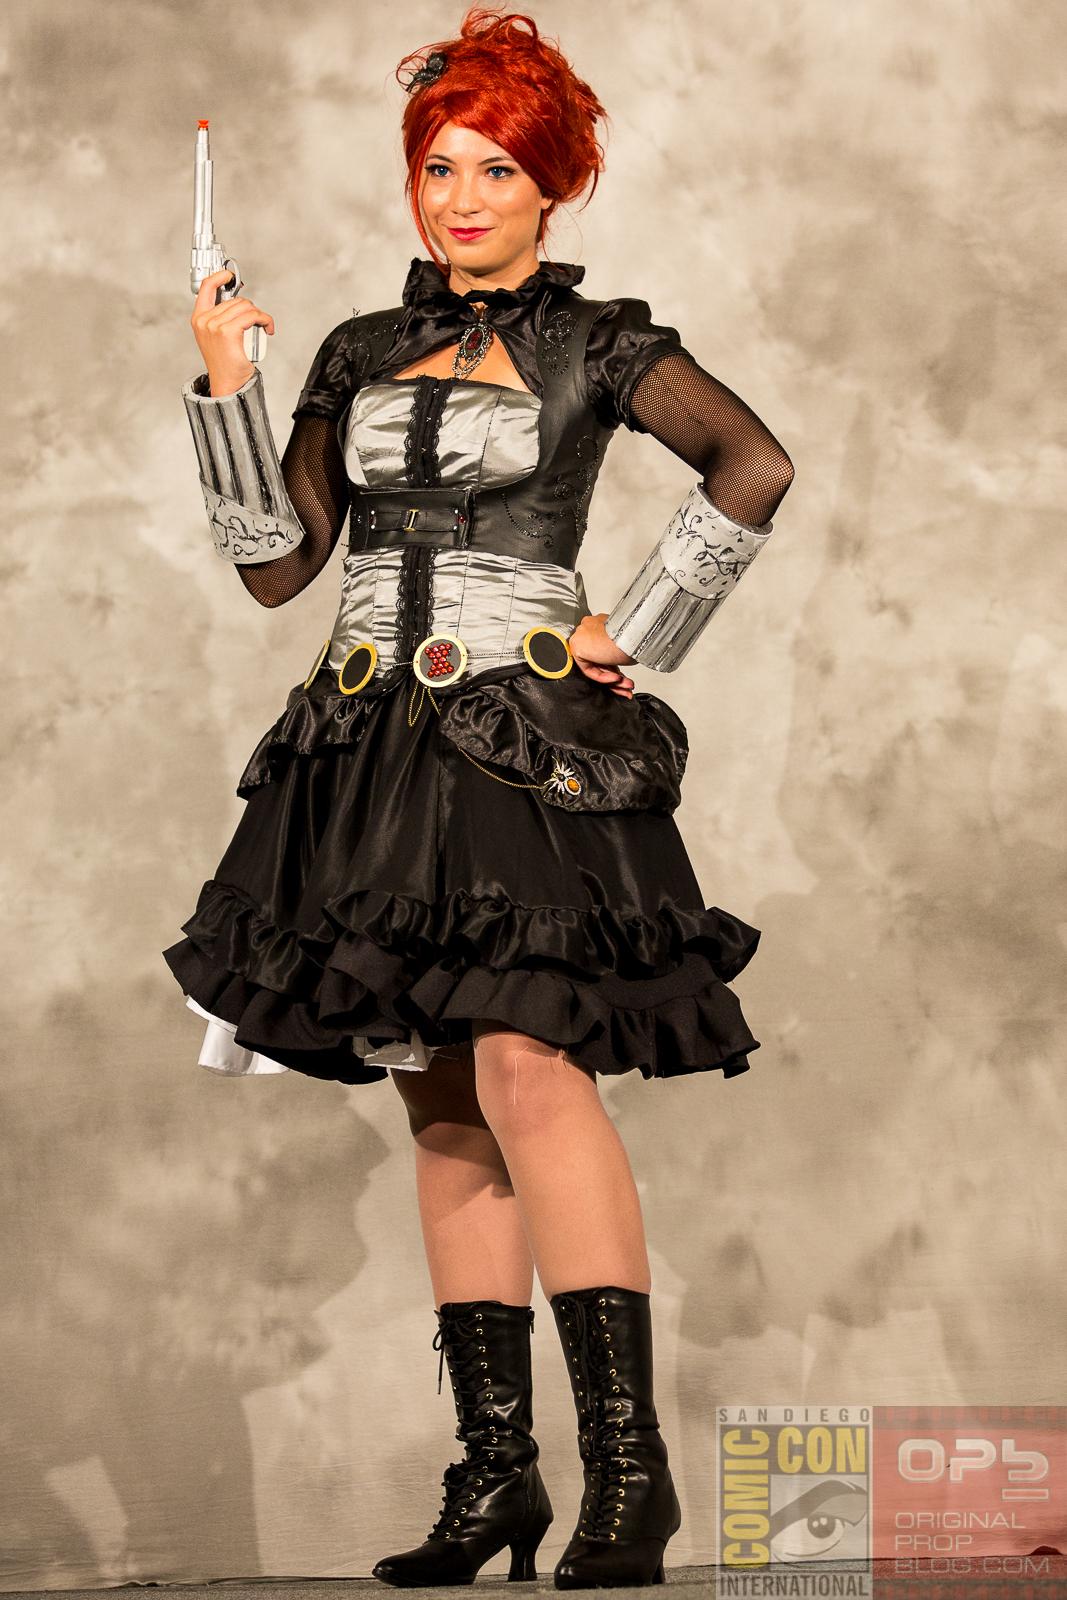 -San-Diego-Comic-Con-International-2014-Masquerade-Photos-Images-News